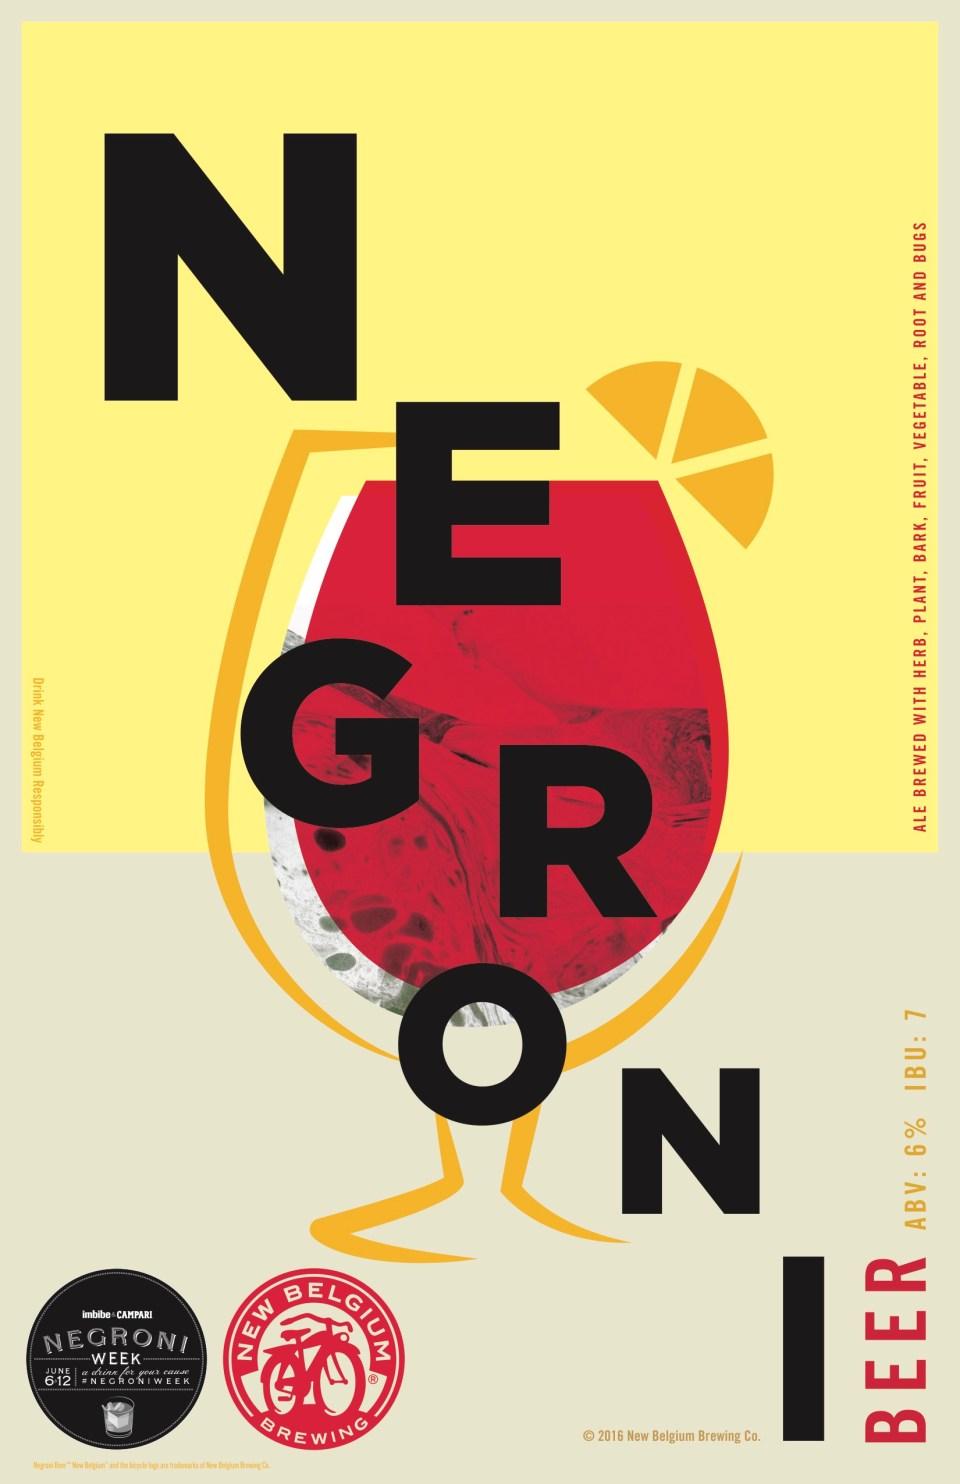 New Belgium Negroni Beer